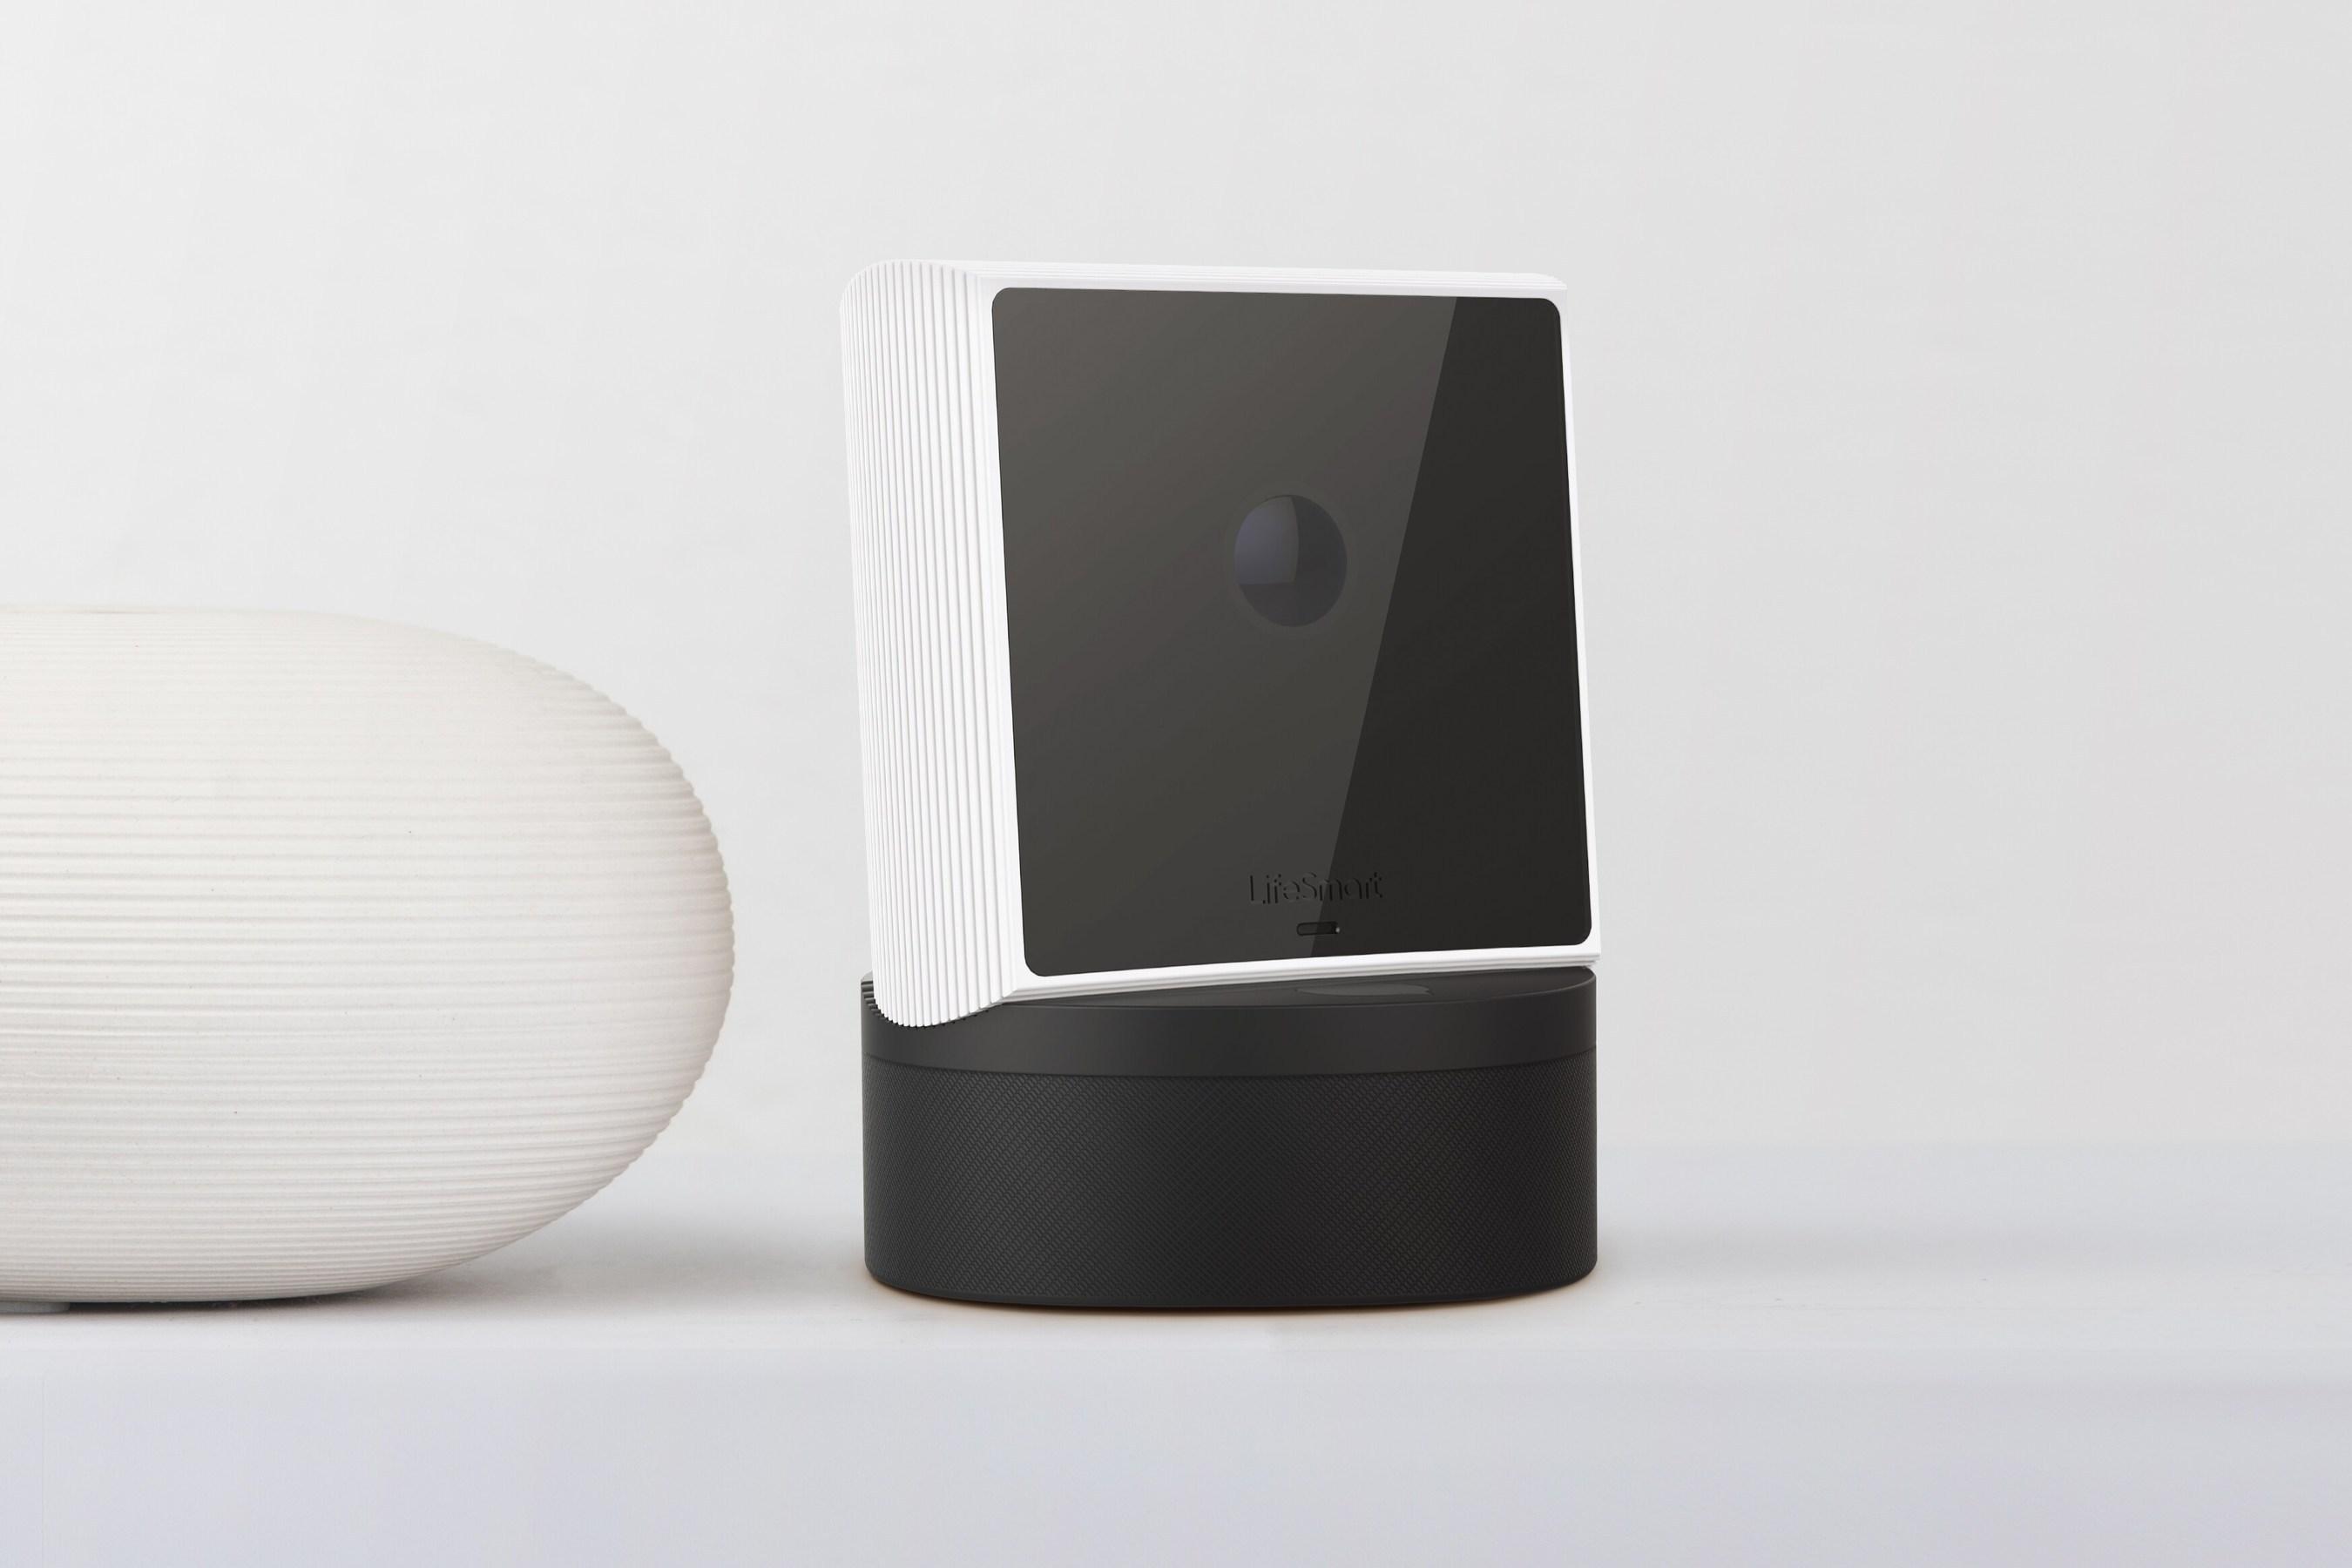 LifeSmart ViewCam -- the world's first true wireless HD camera with 360 degree rotation